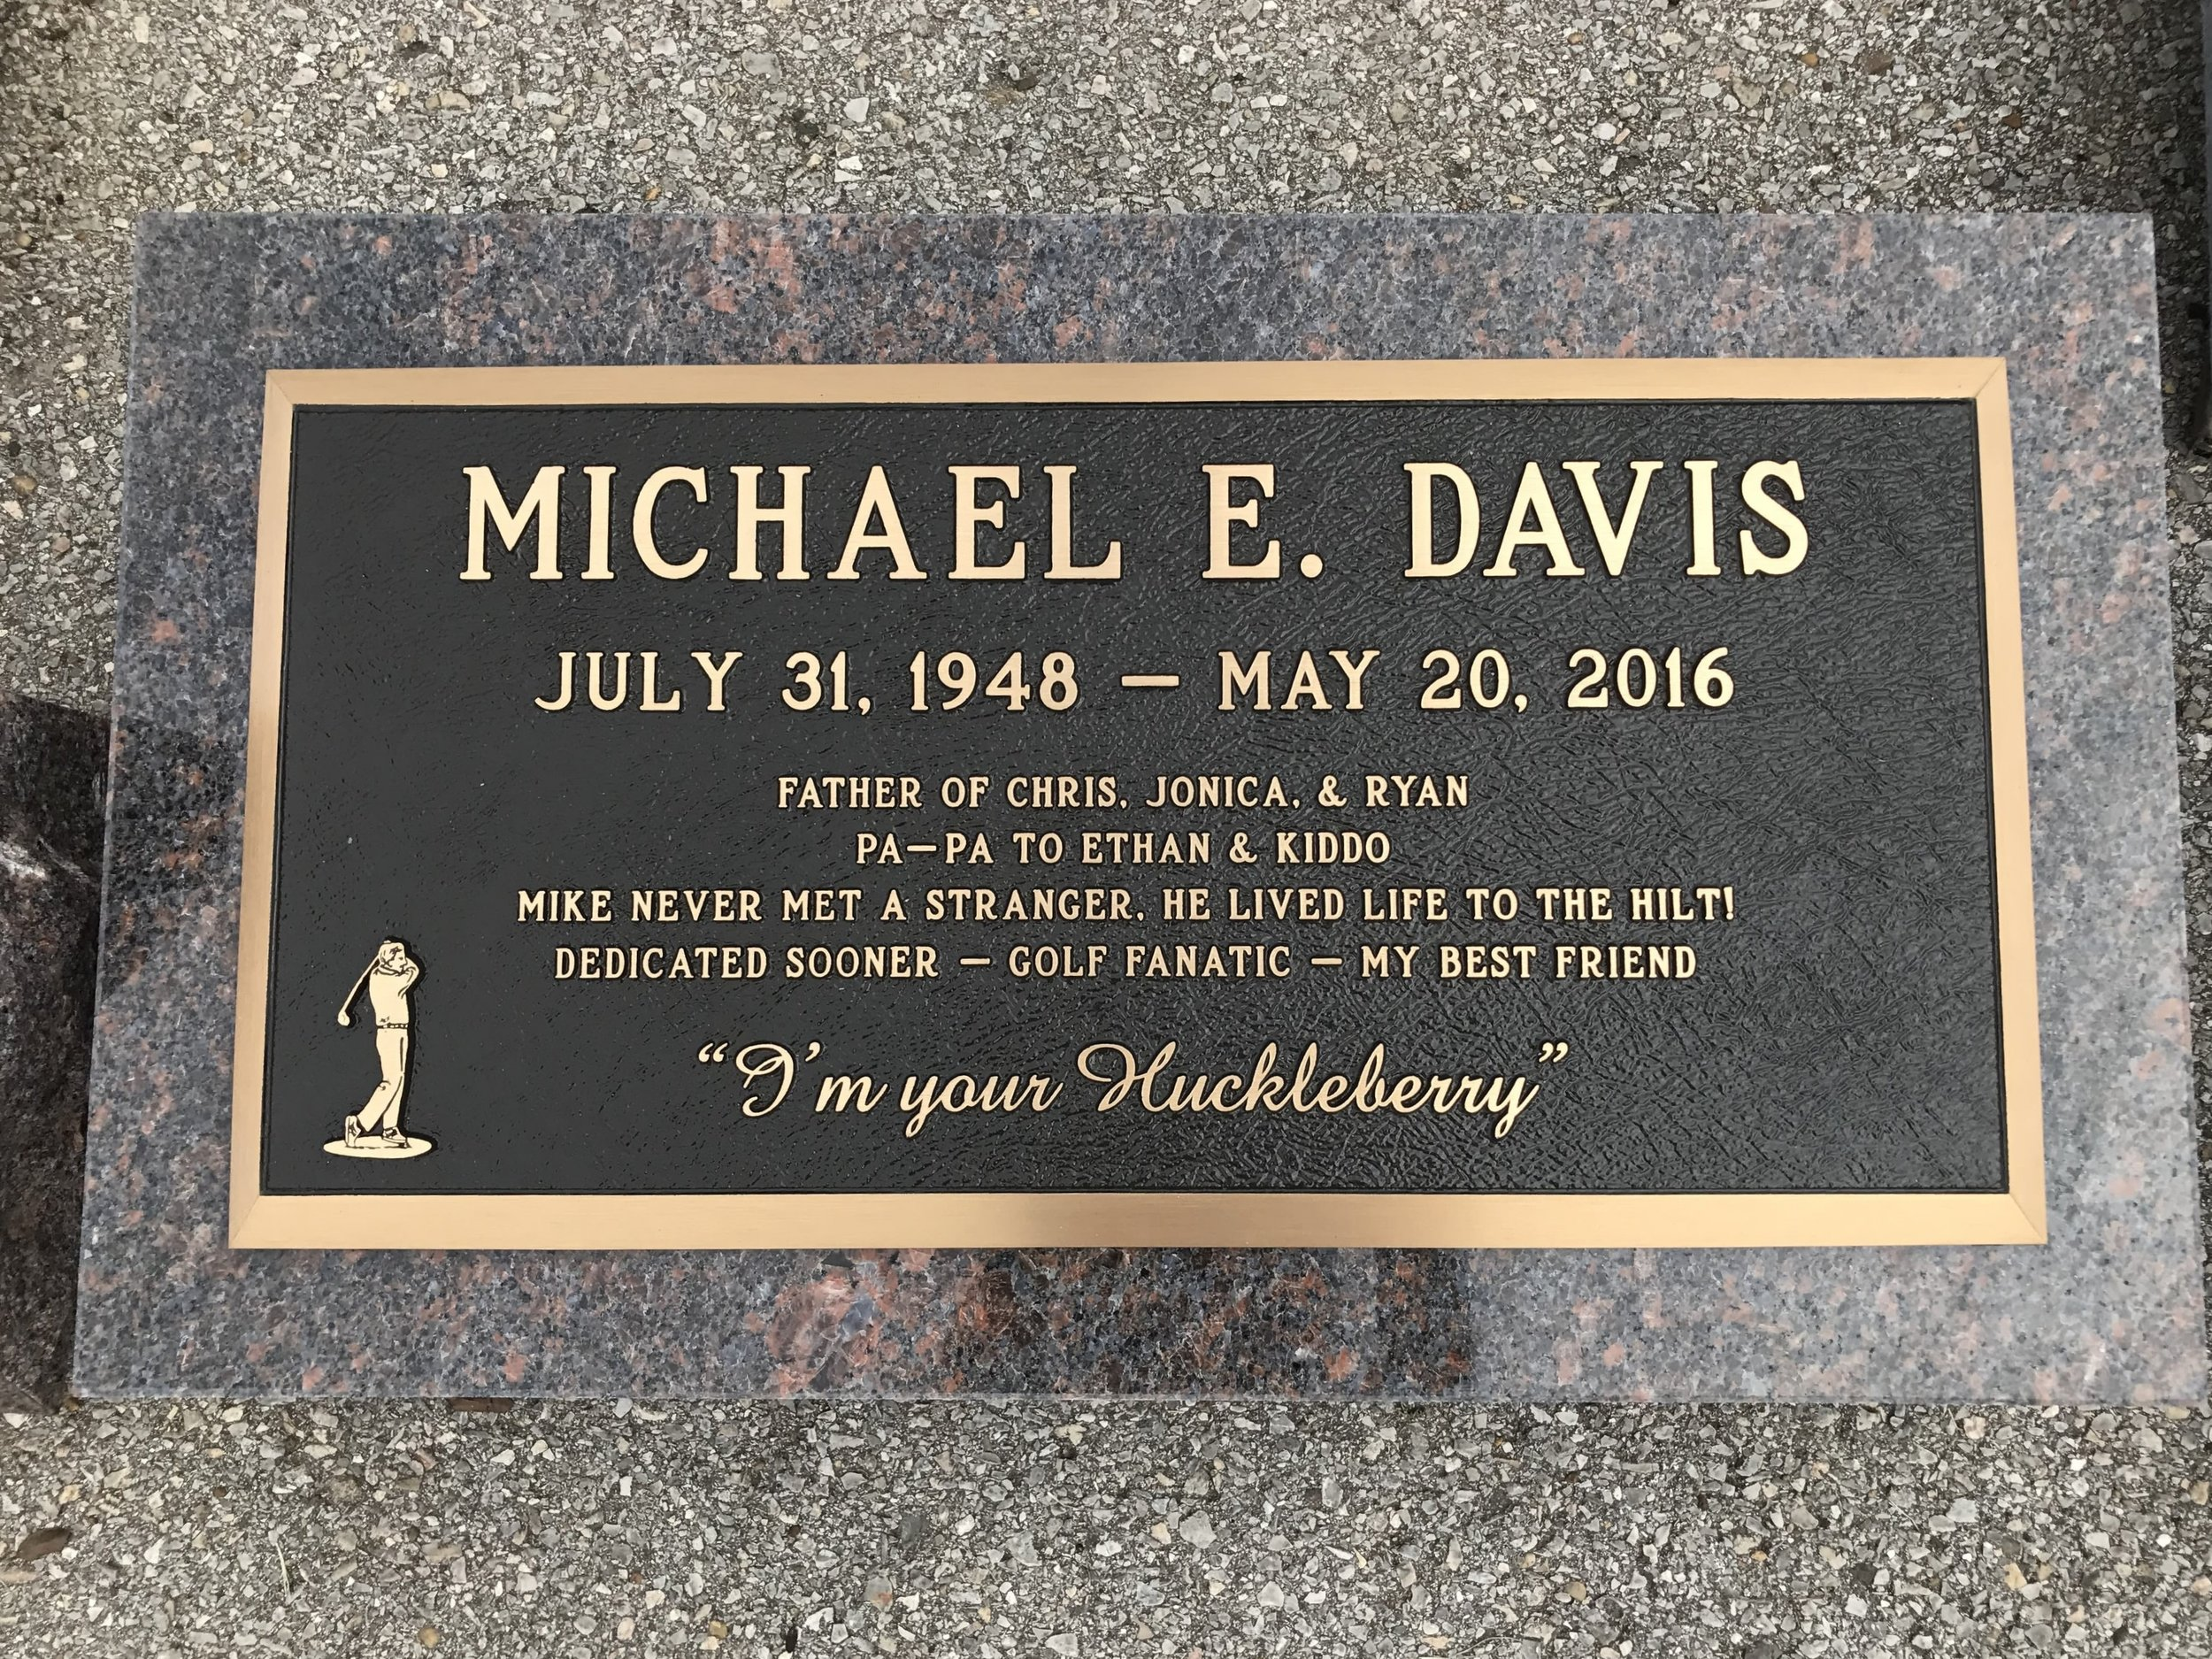 3. Chapel Hill Cemetery